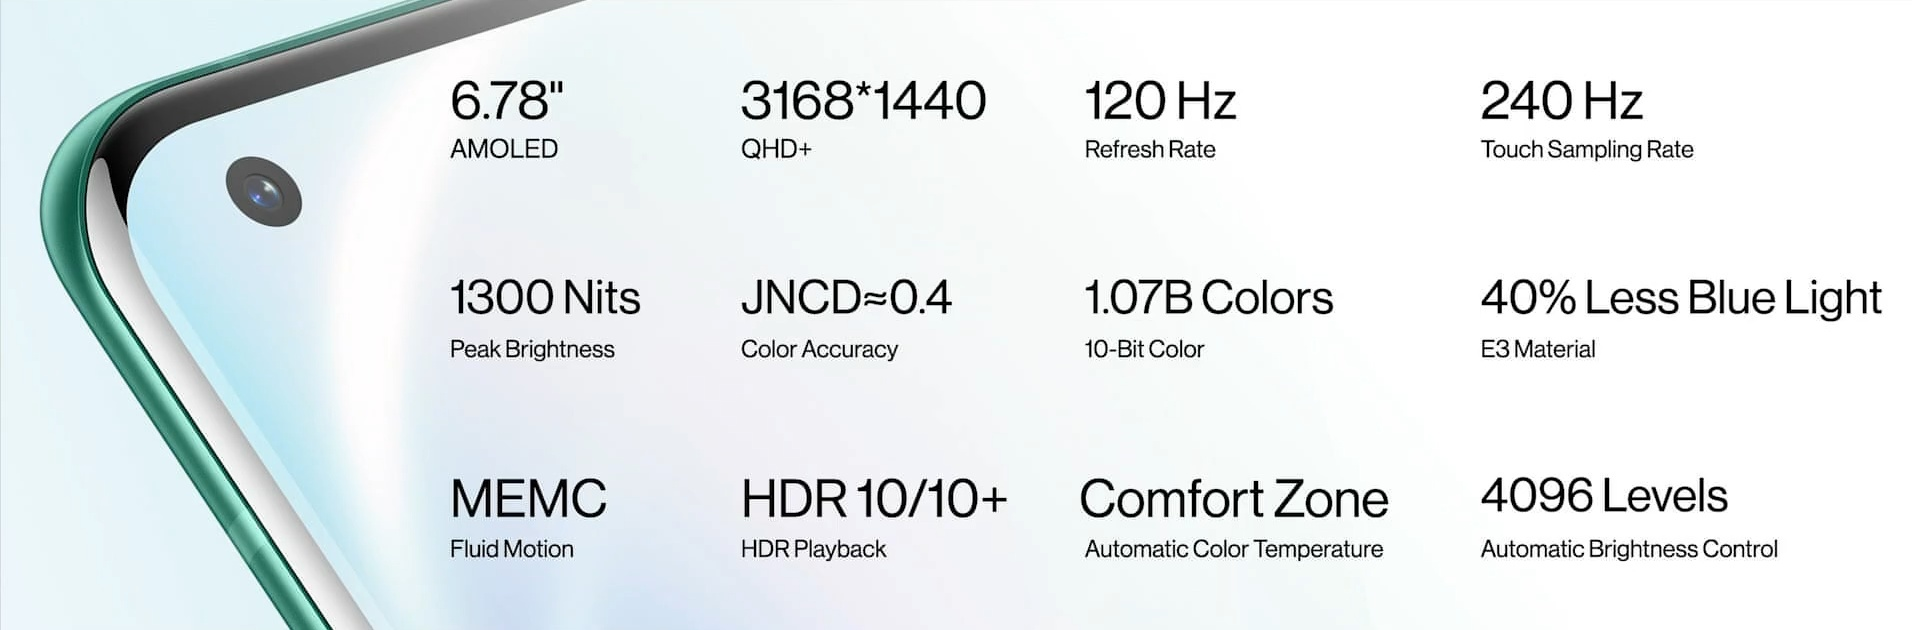 OnePlus 8 Pro - Display